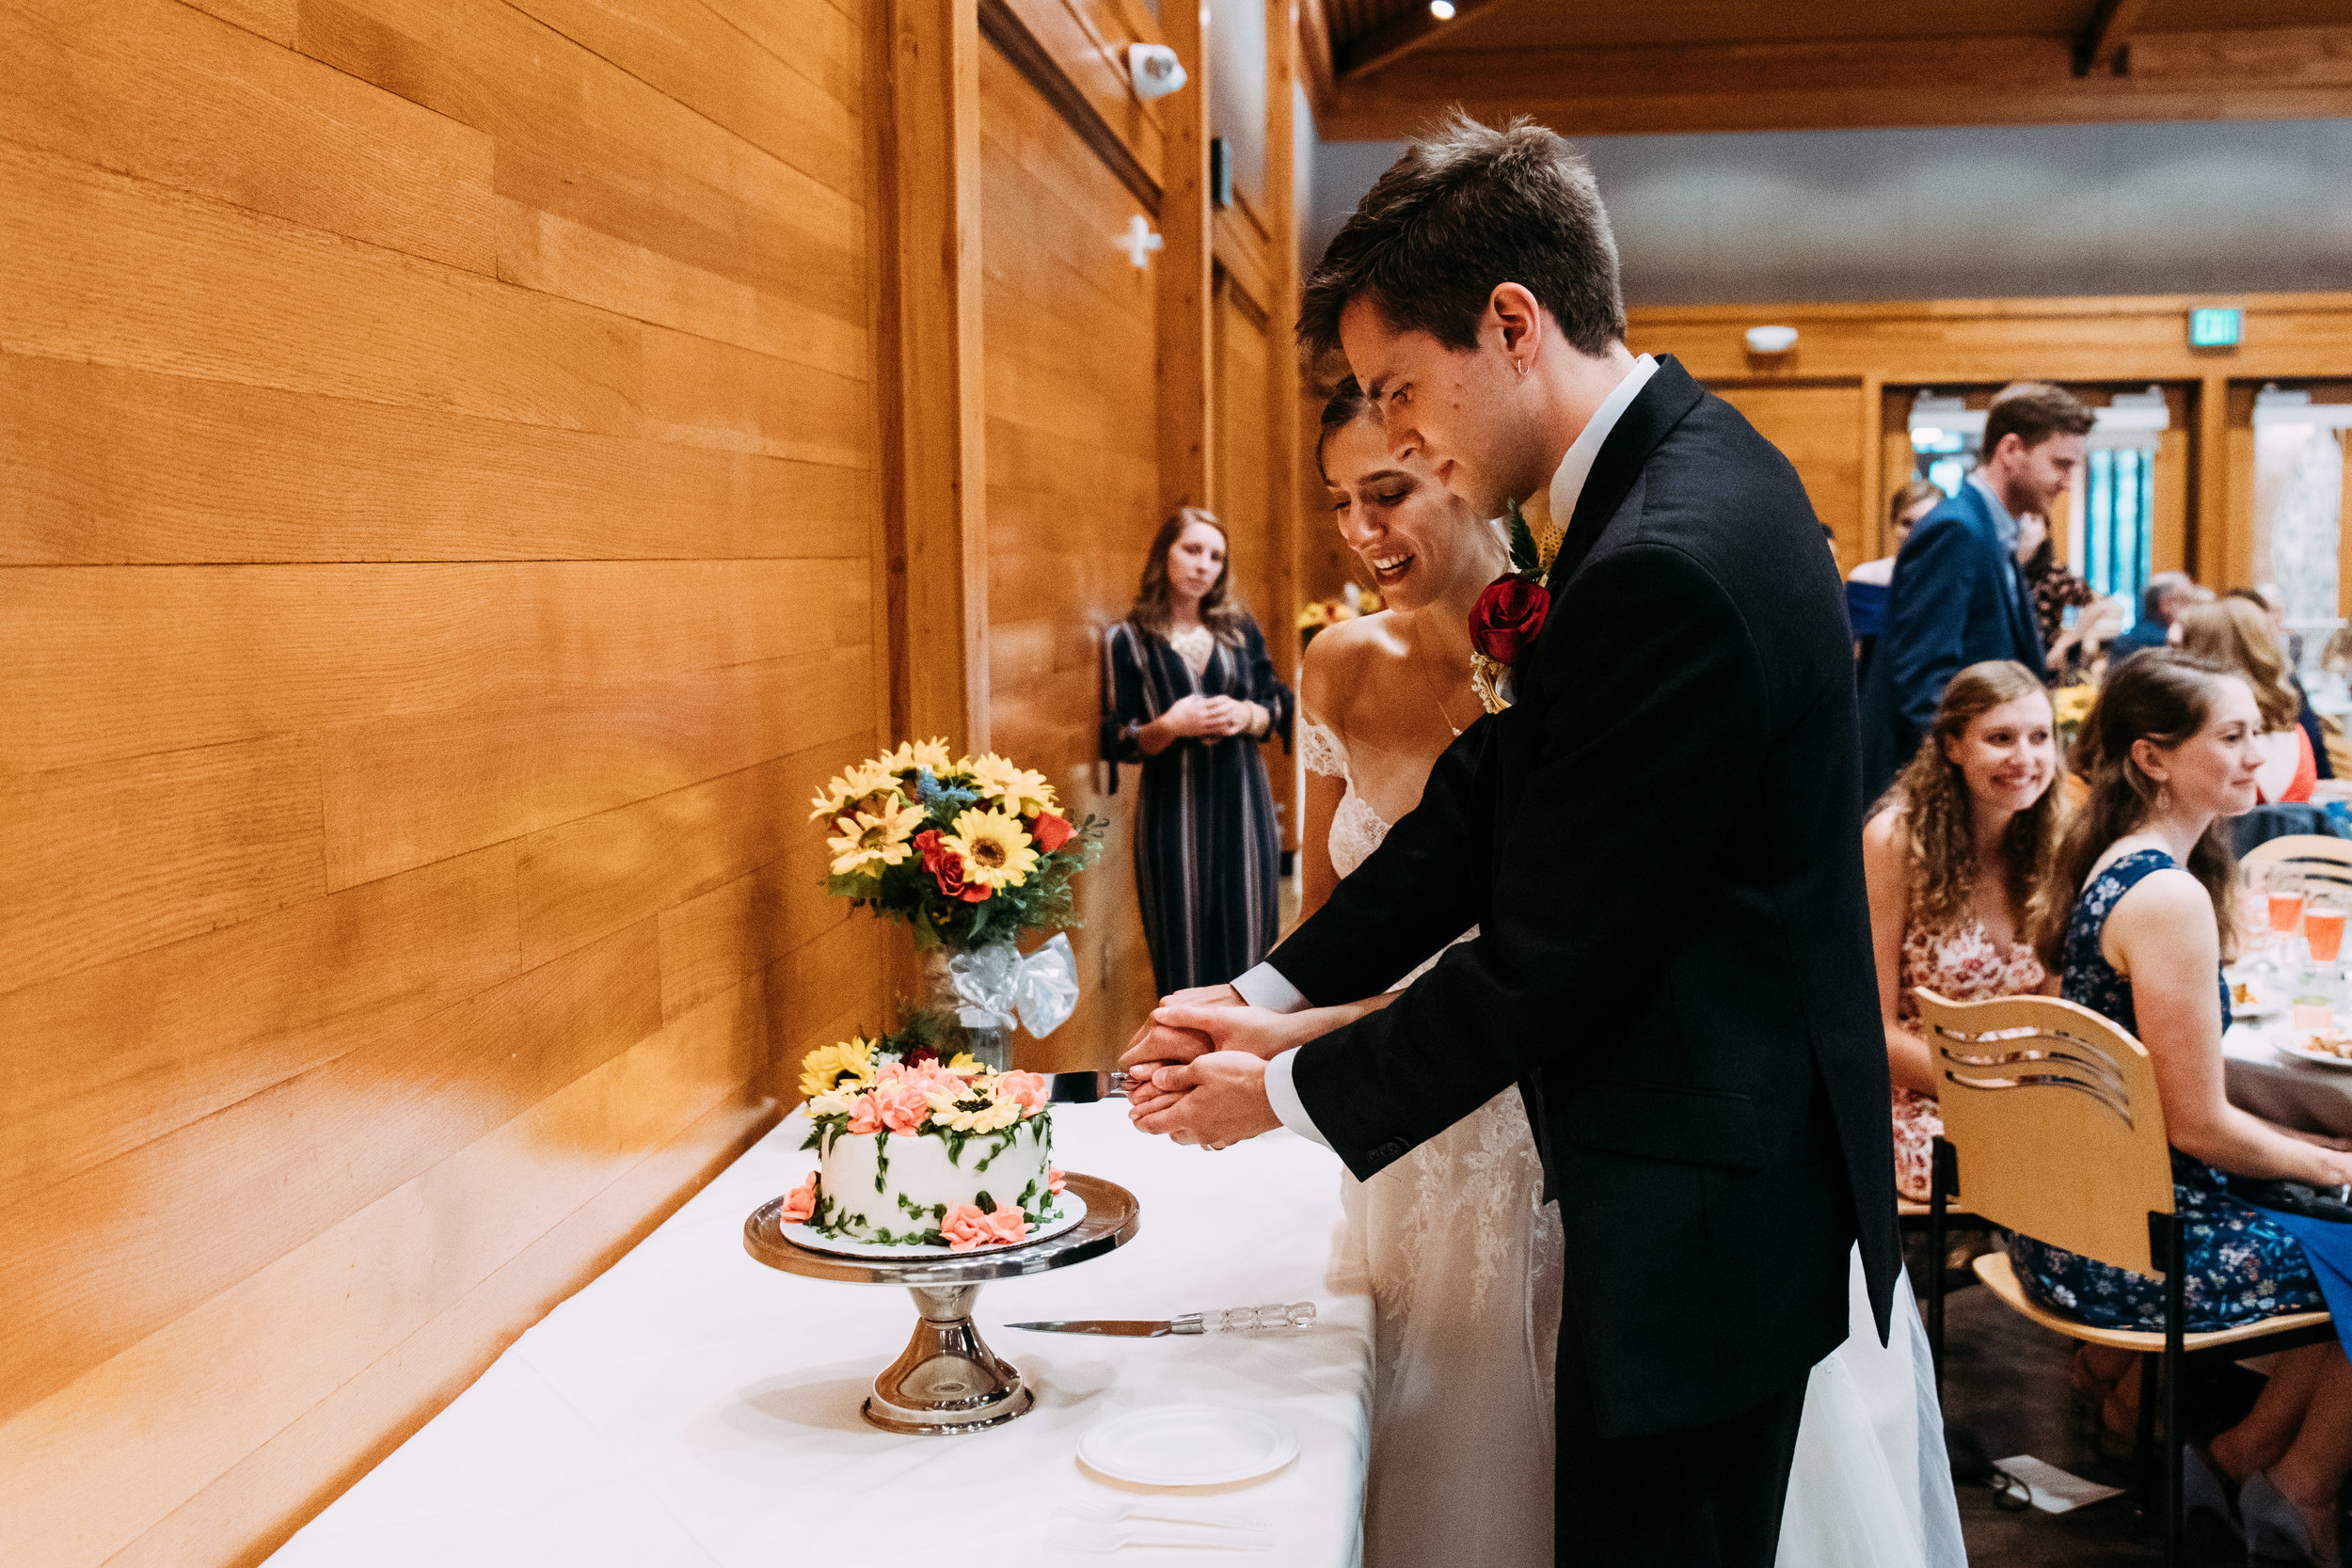 35-Liza_Chris_Minneapolis_Minnesota_Wedding.jpg